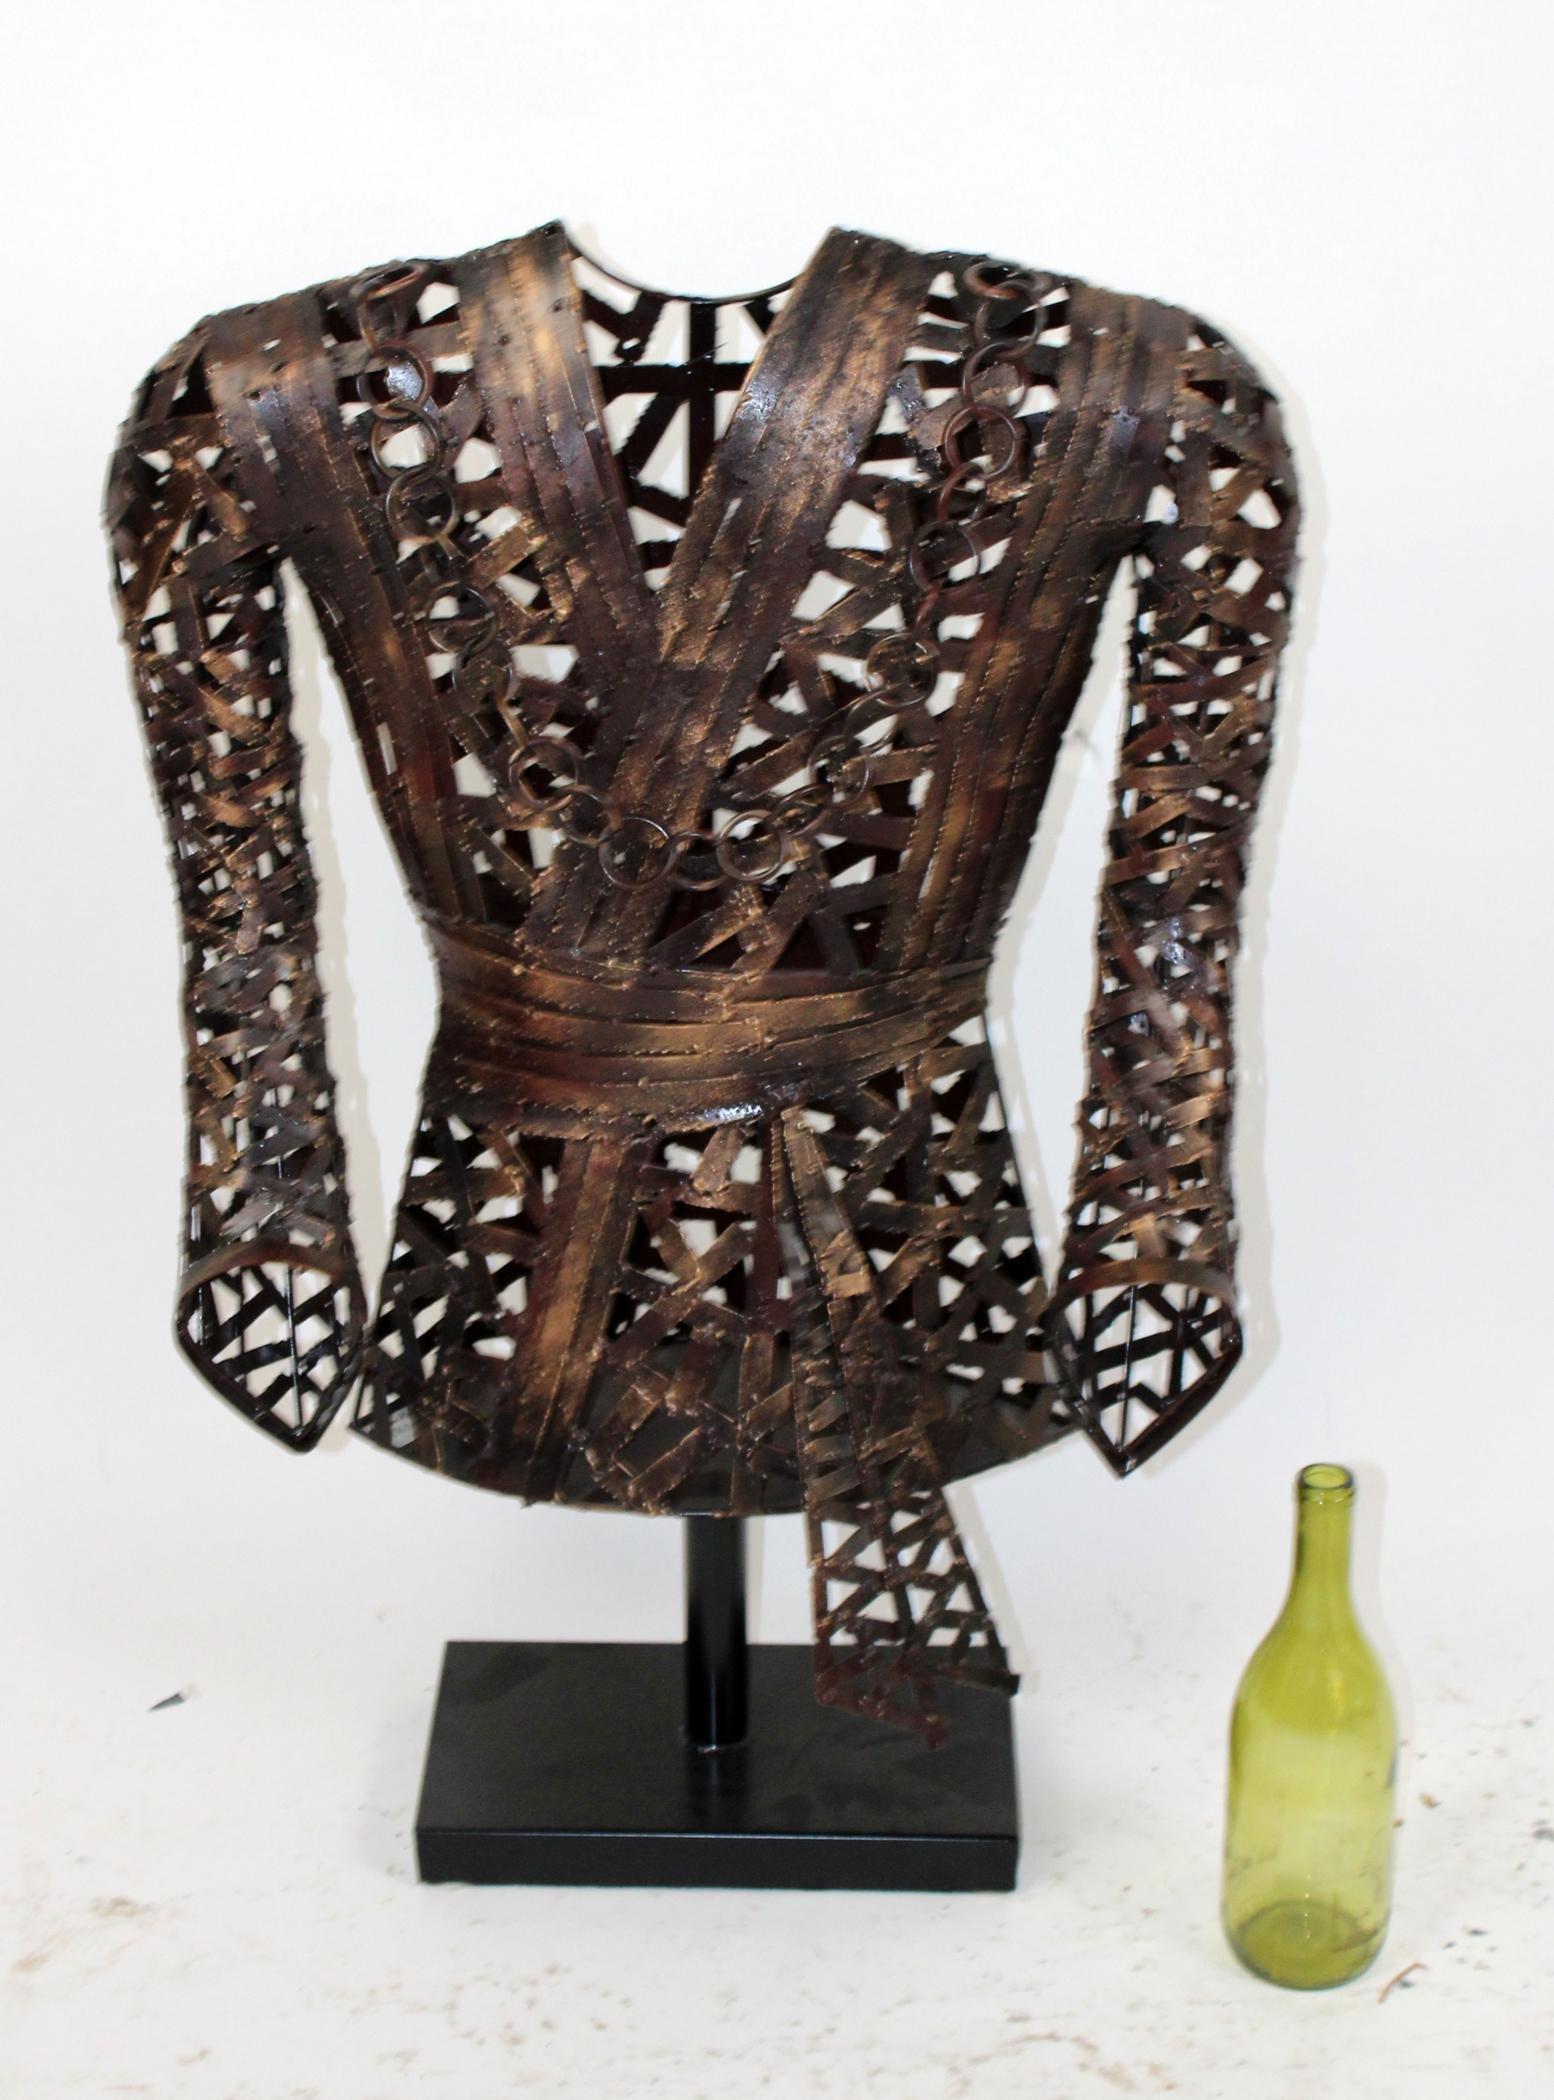 John Richard metal sculpture of a robe